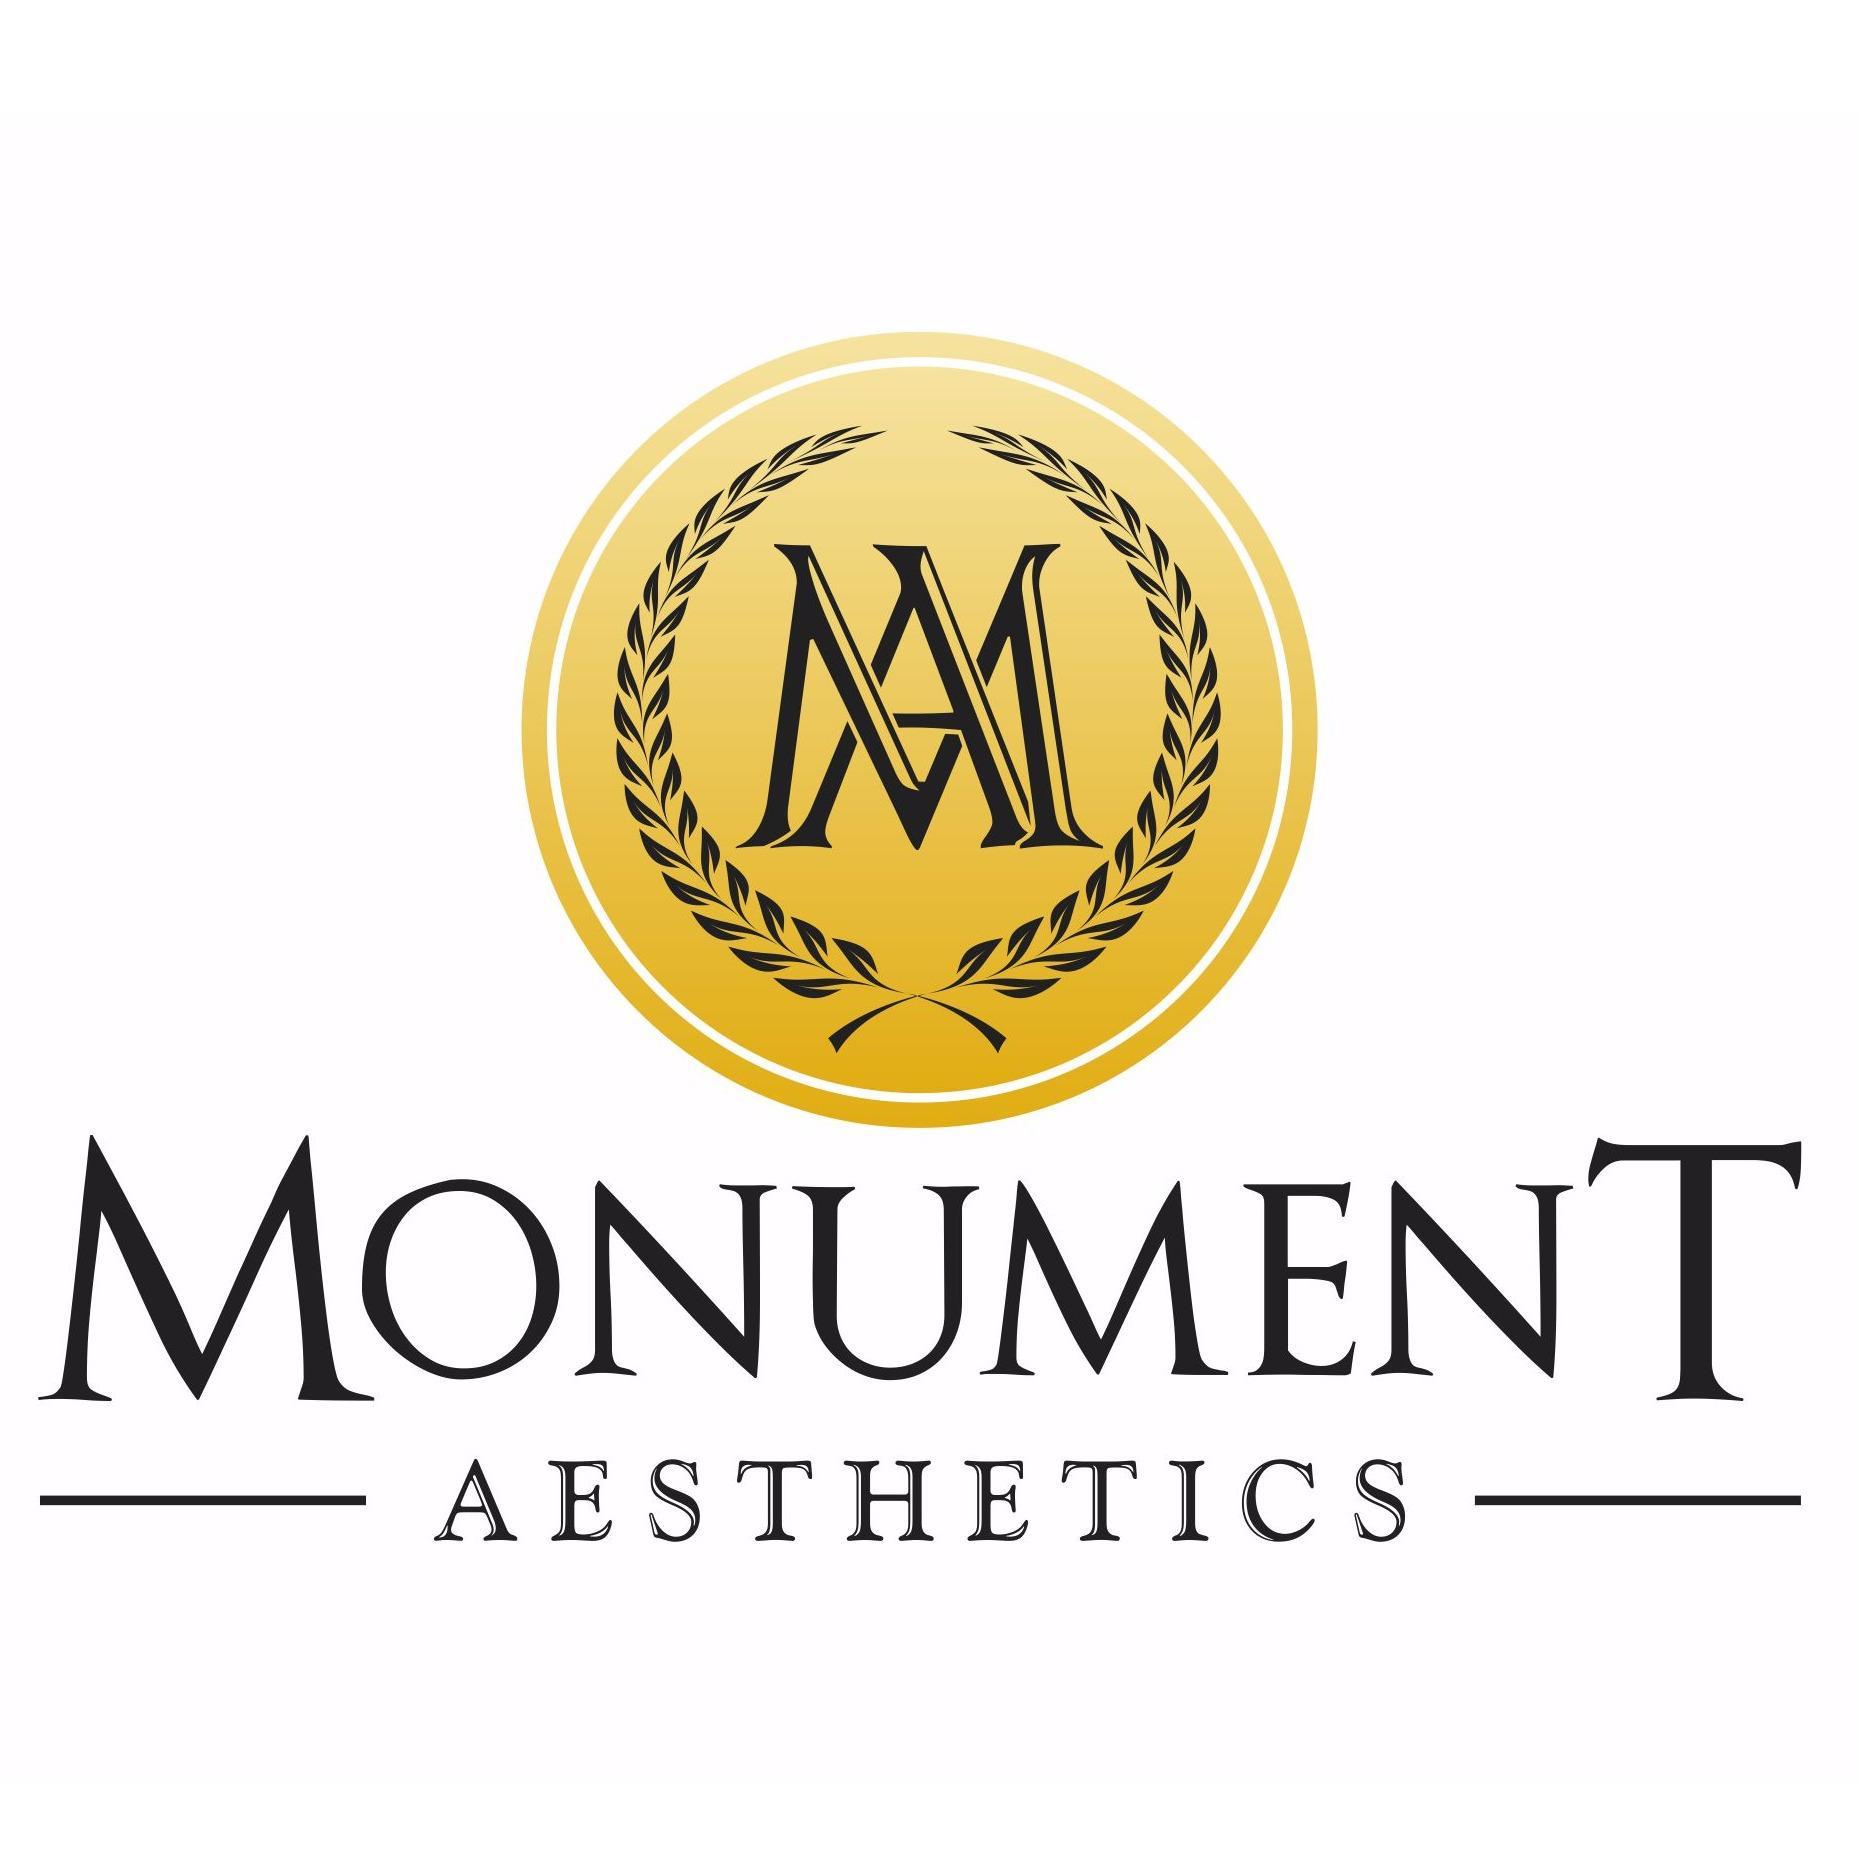 Monument Aesthetics image 4